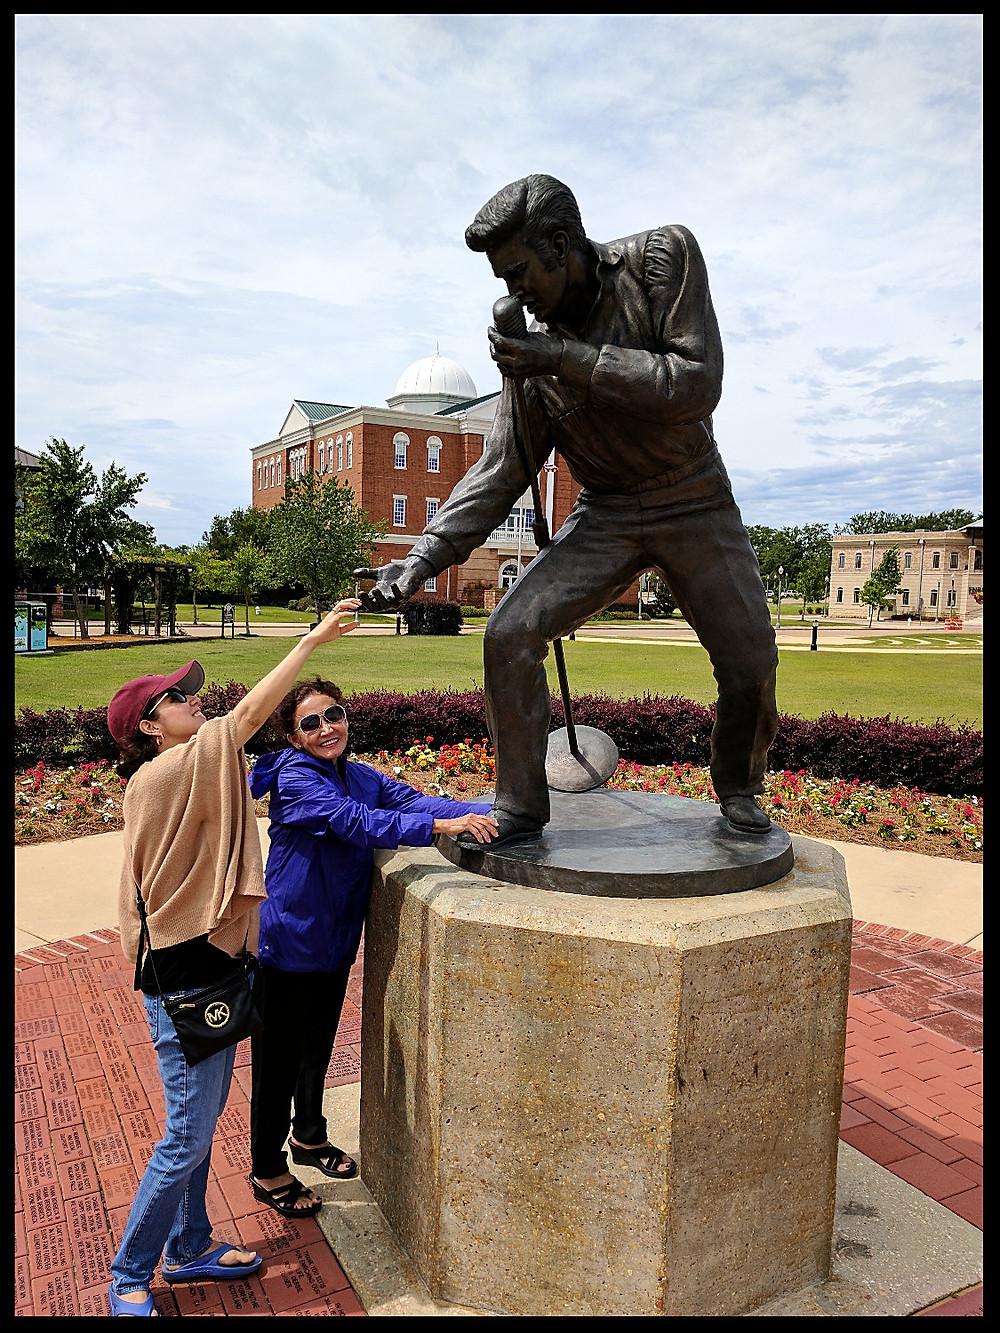 Elvis Presley Homecoming Statue, Tupelo, Mississippi.